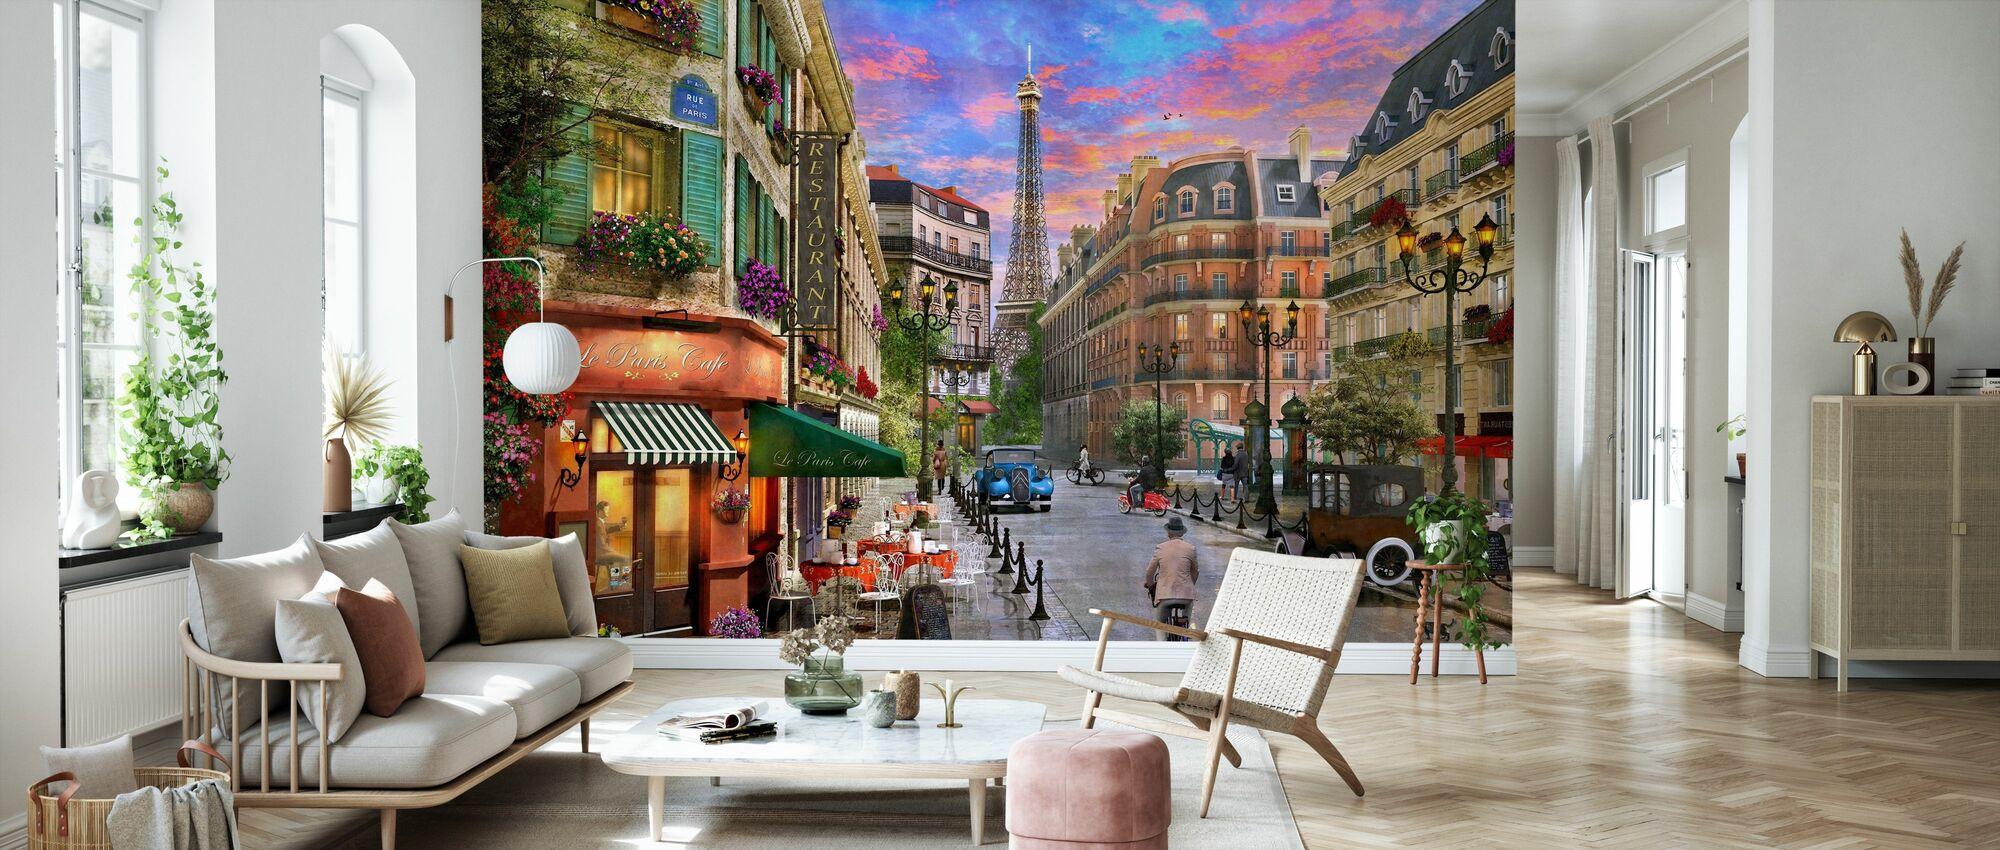 Paris Street - Wallpaper - Living Room